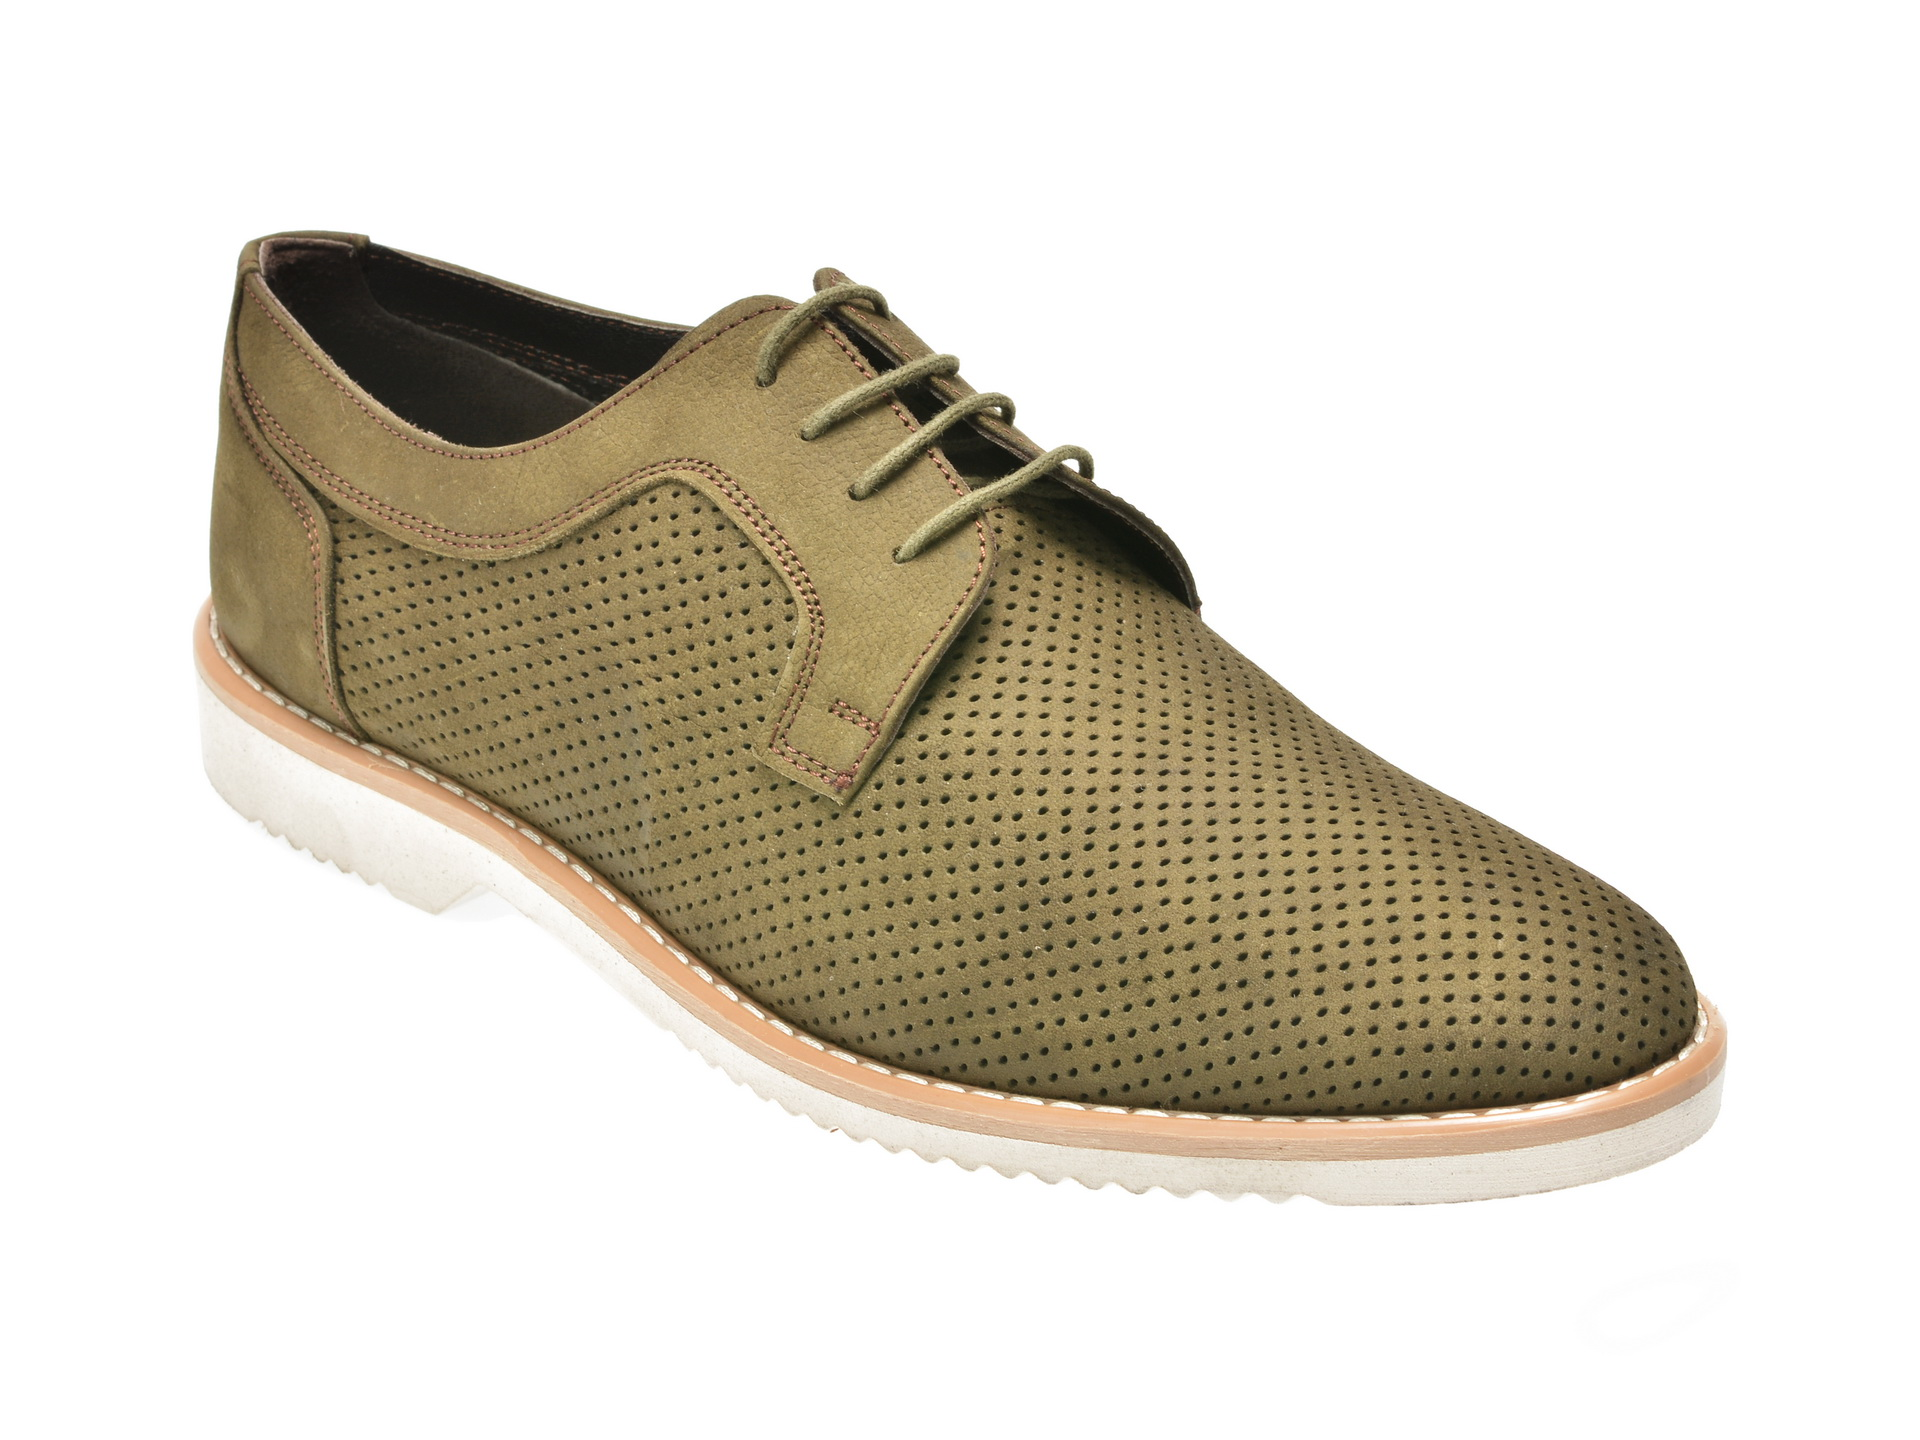 Pantofi OTTER kaky, 1307, din nabuc